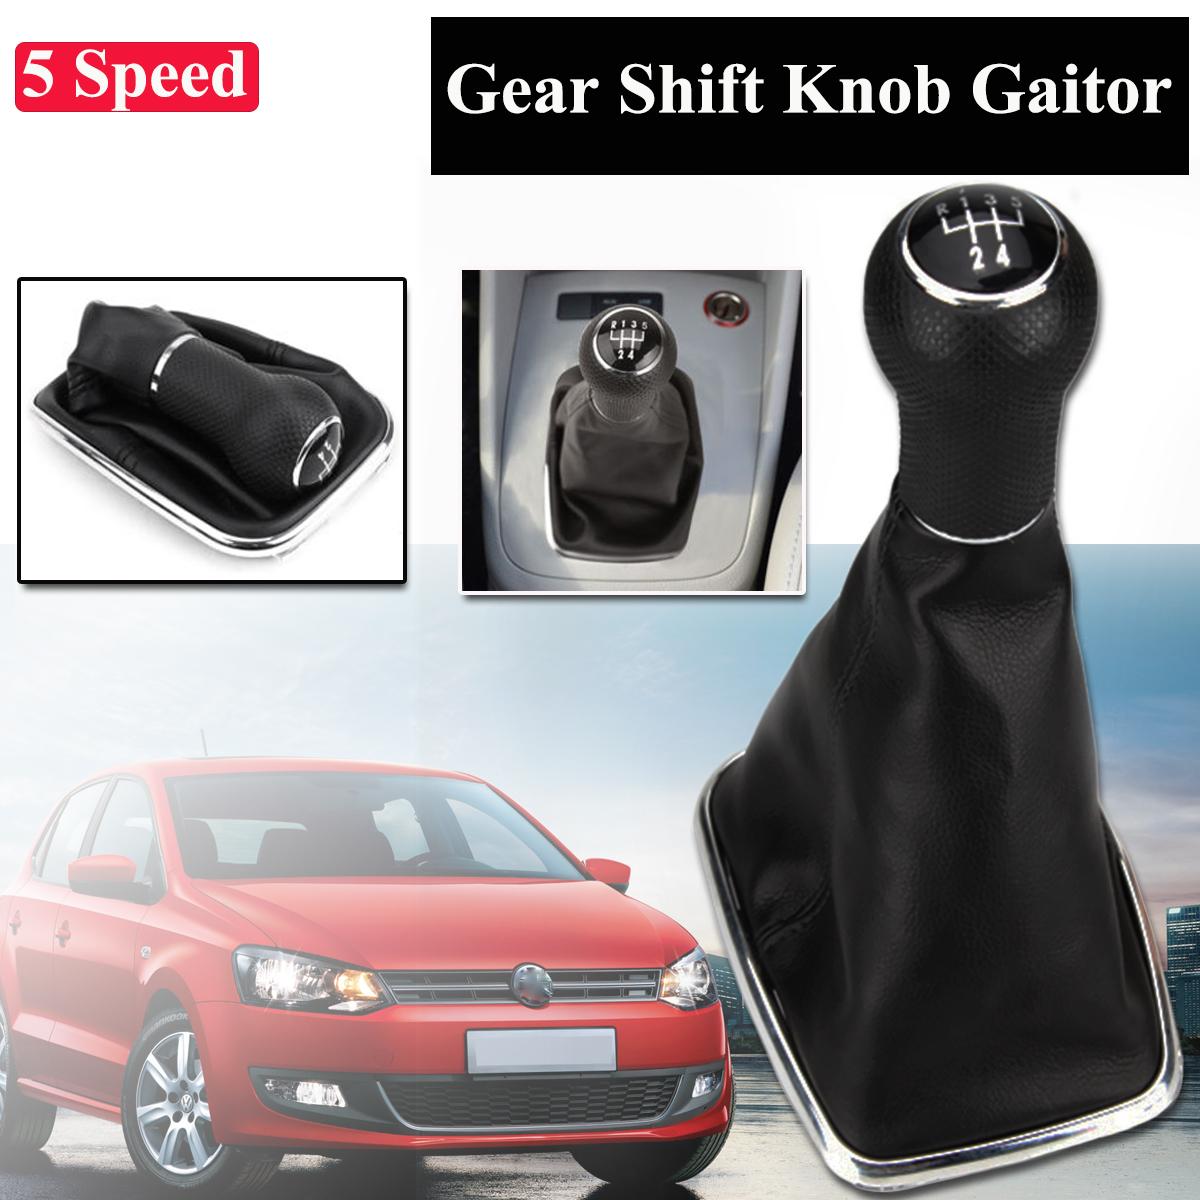 Madezz Car Gear Shift Knob Gaiter Boot T6 2003-2011 5 Speed Gear Shifter Knob Gearstick Gaiter Boot Kit For Transporter T5